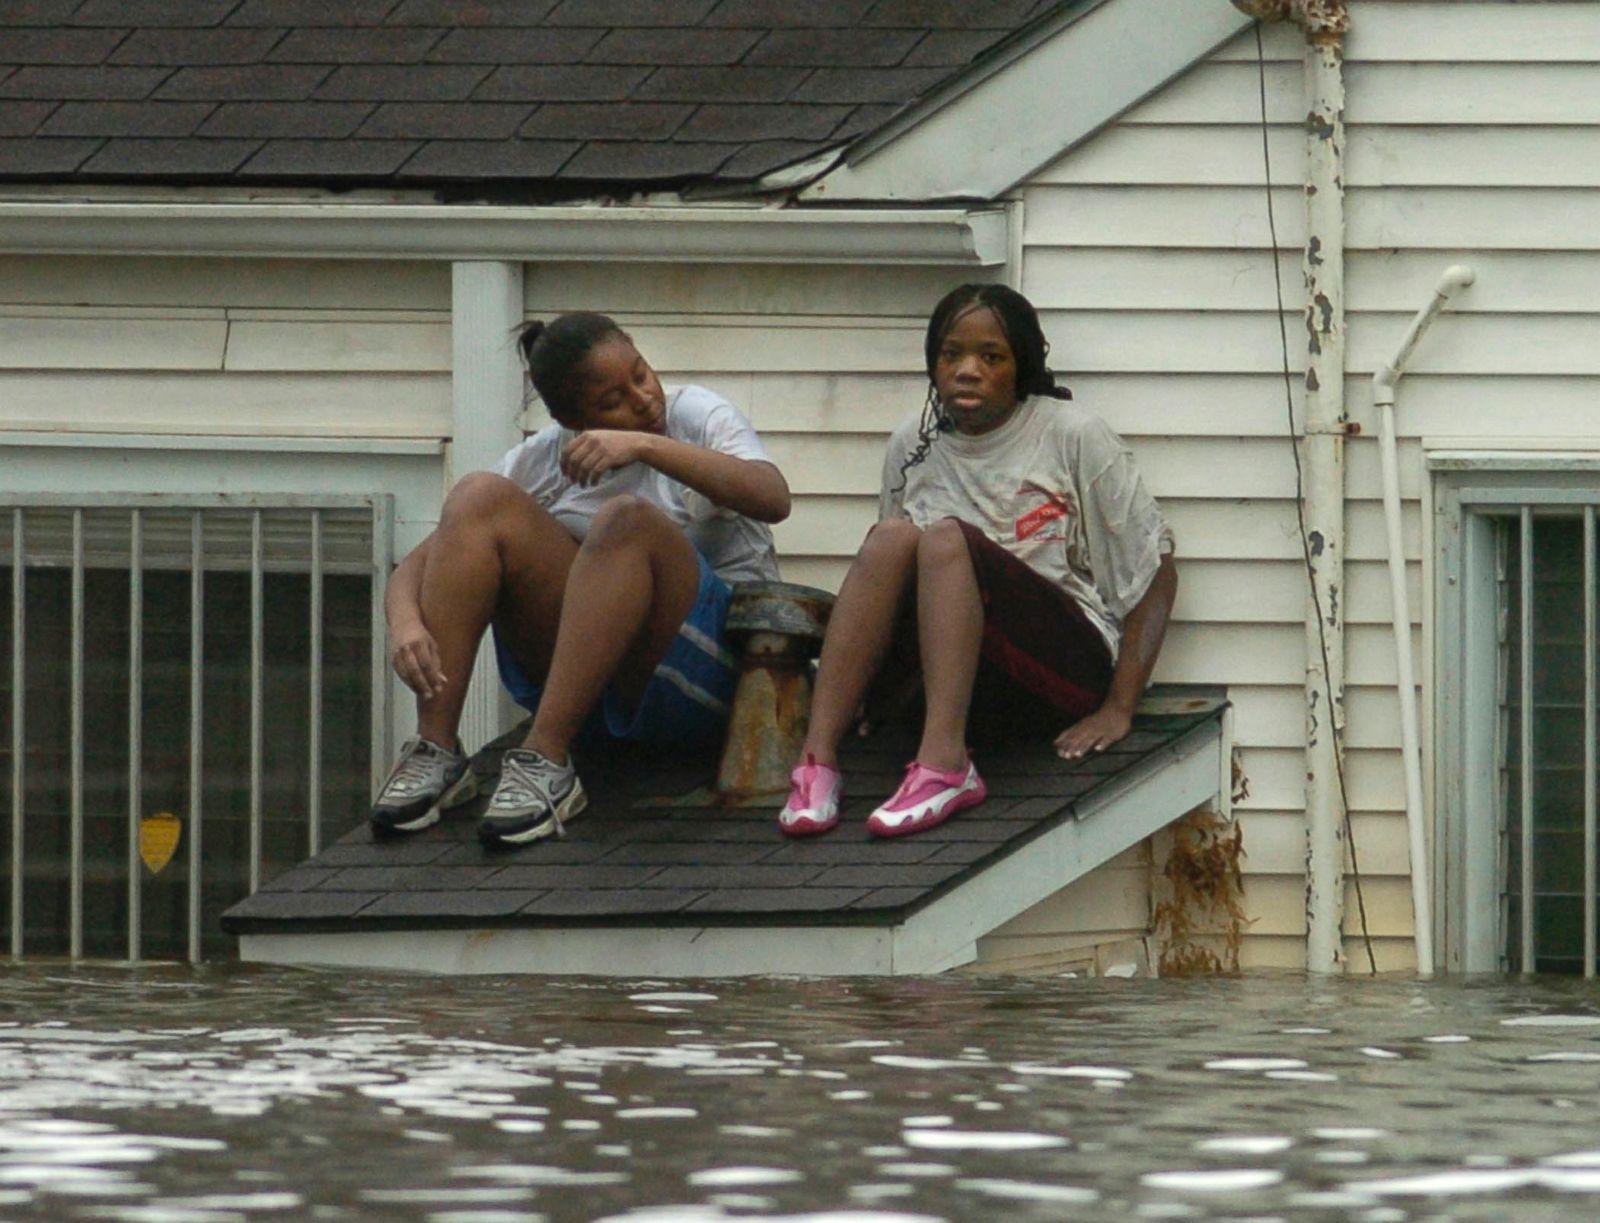 hurricane katrina 10 years later new orleans photojournalist tells